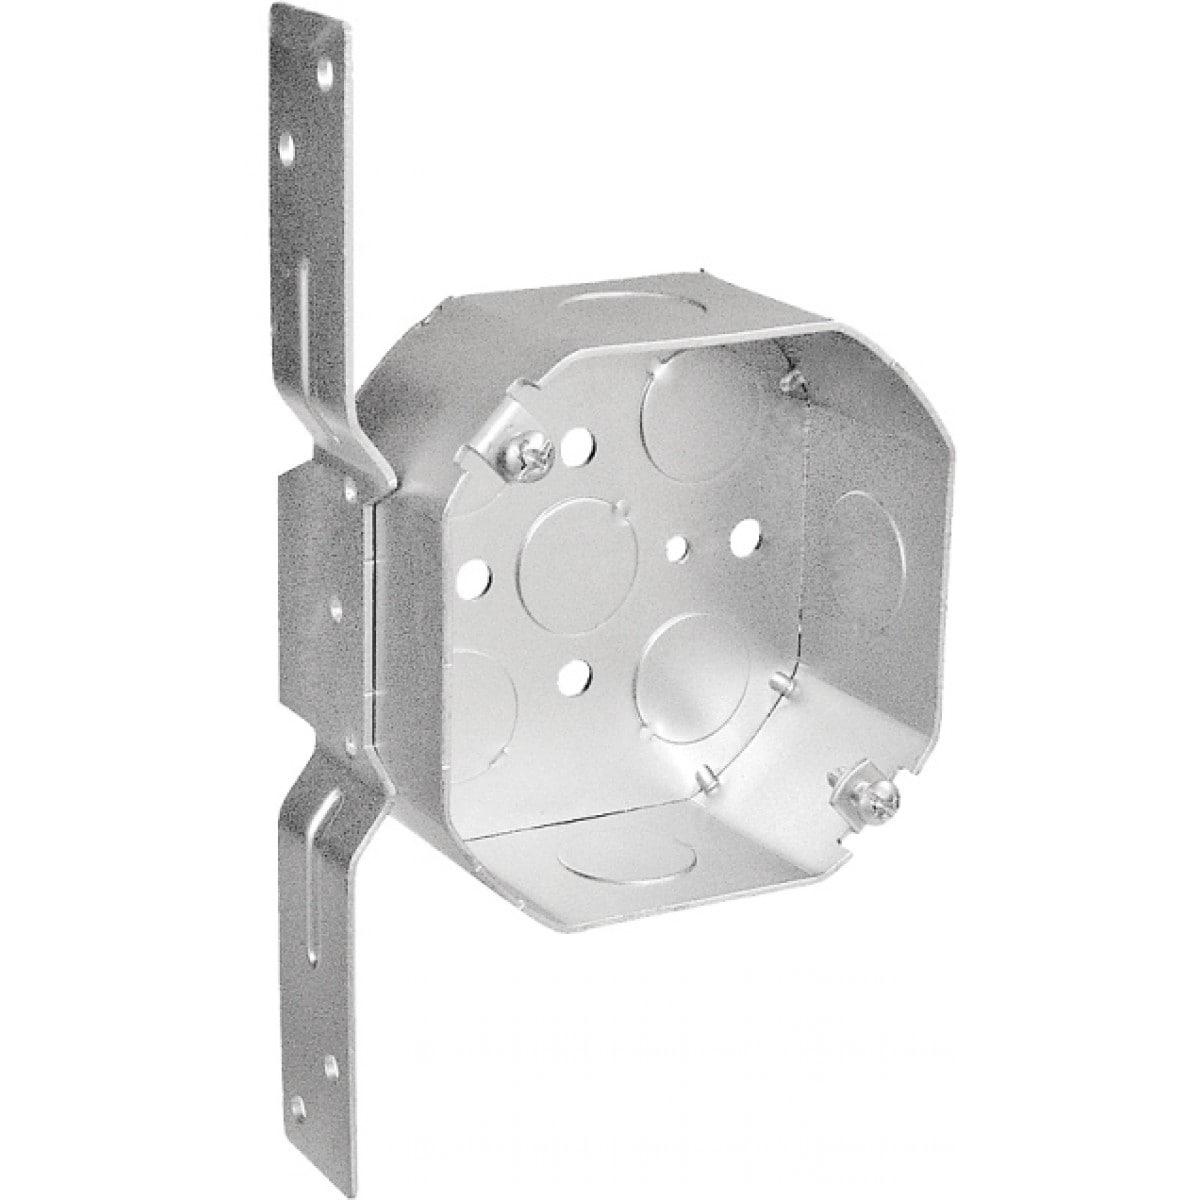 10 Pcs, 4 in. Octagon Box, 1-1/2 in. Deep, Flat Vertical Bracket, .0625 Galvanized Steel